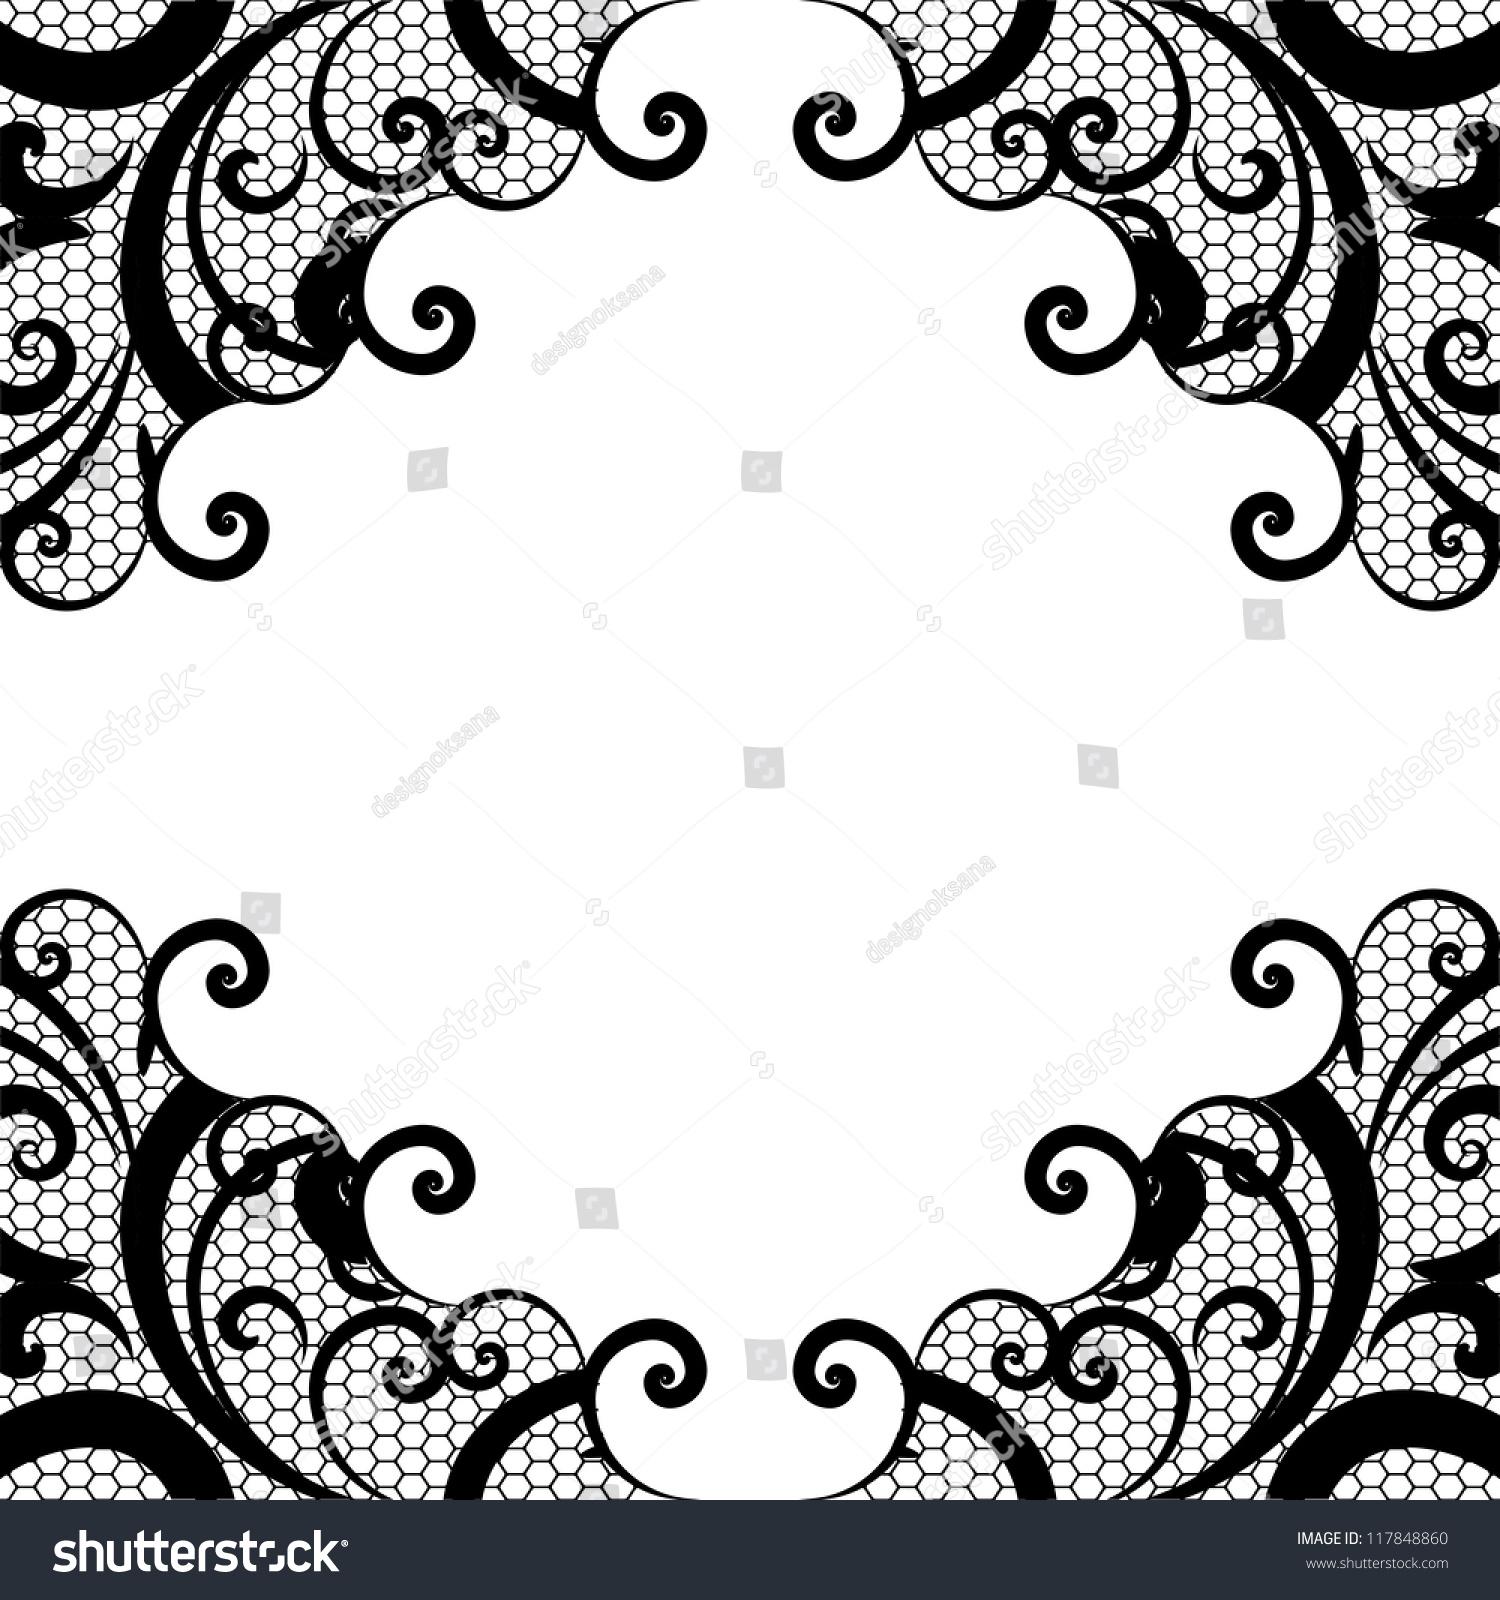 Grunge Halftone Black White Abstract Black